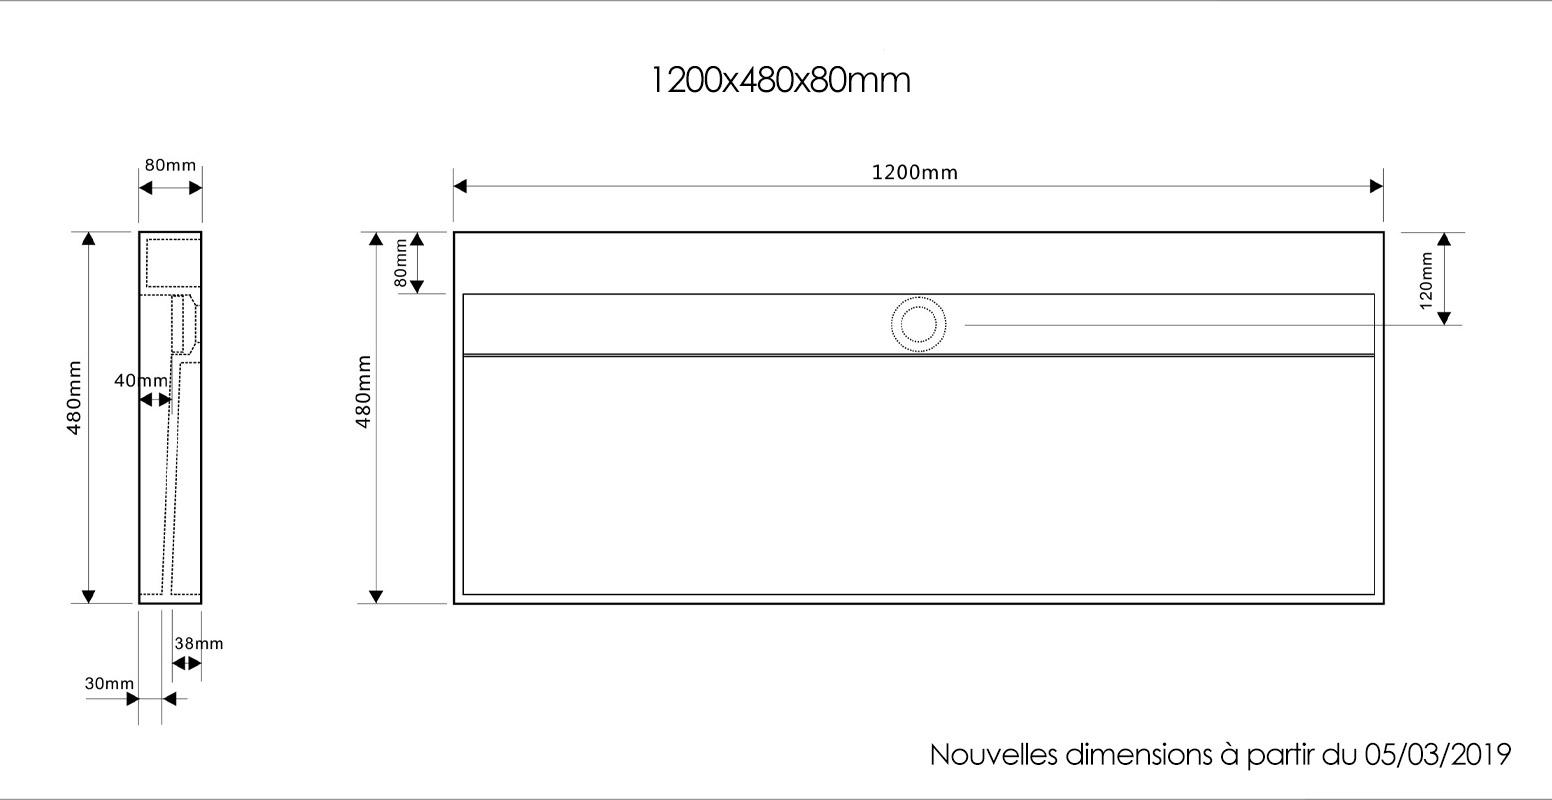 TECHNICAL DRAWING nouveau-schema-vasque-mineral-12